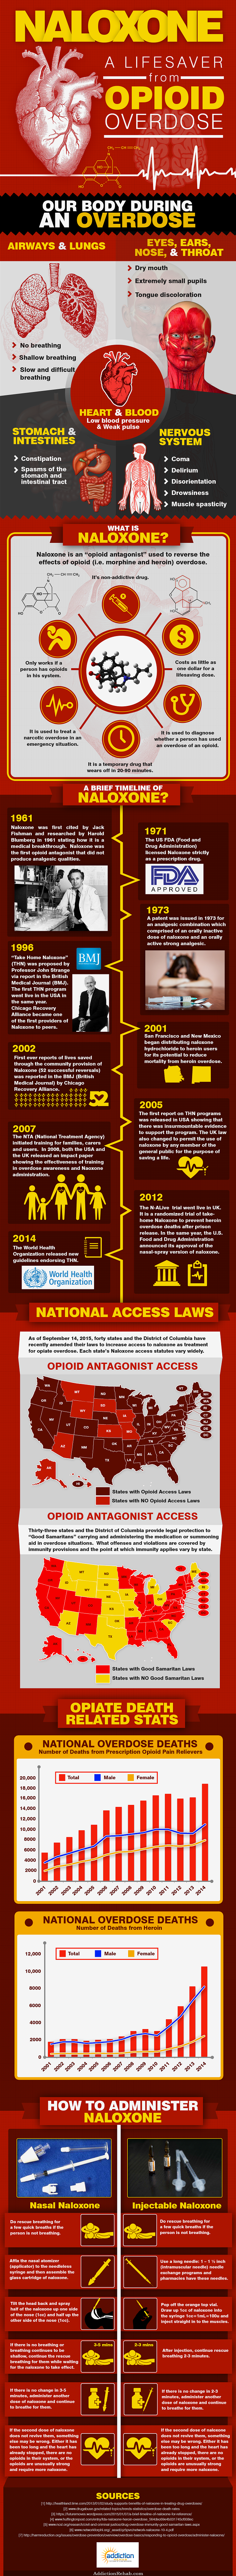 Naloxone: A Lifesaver From Opioid Overdose